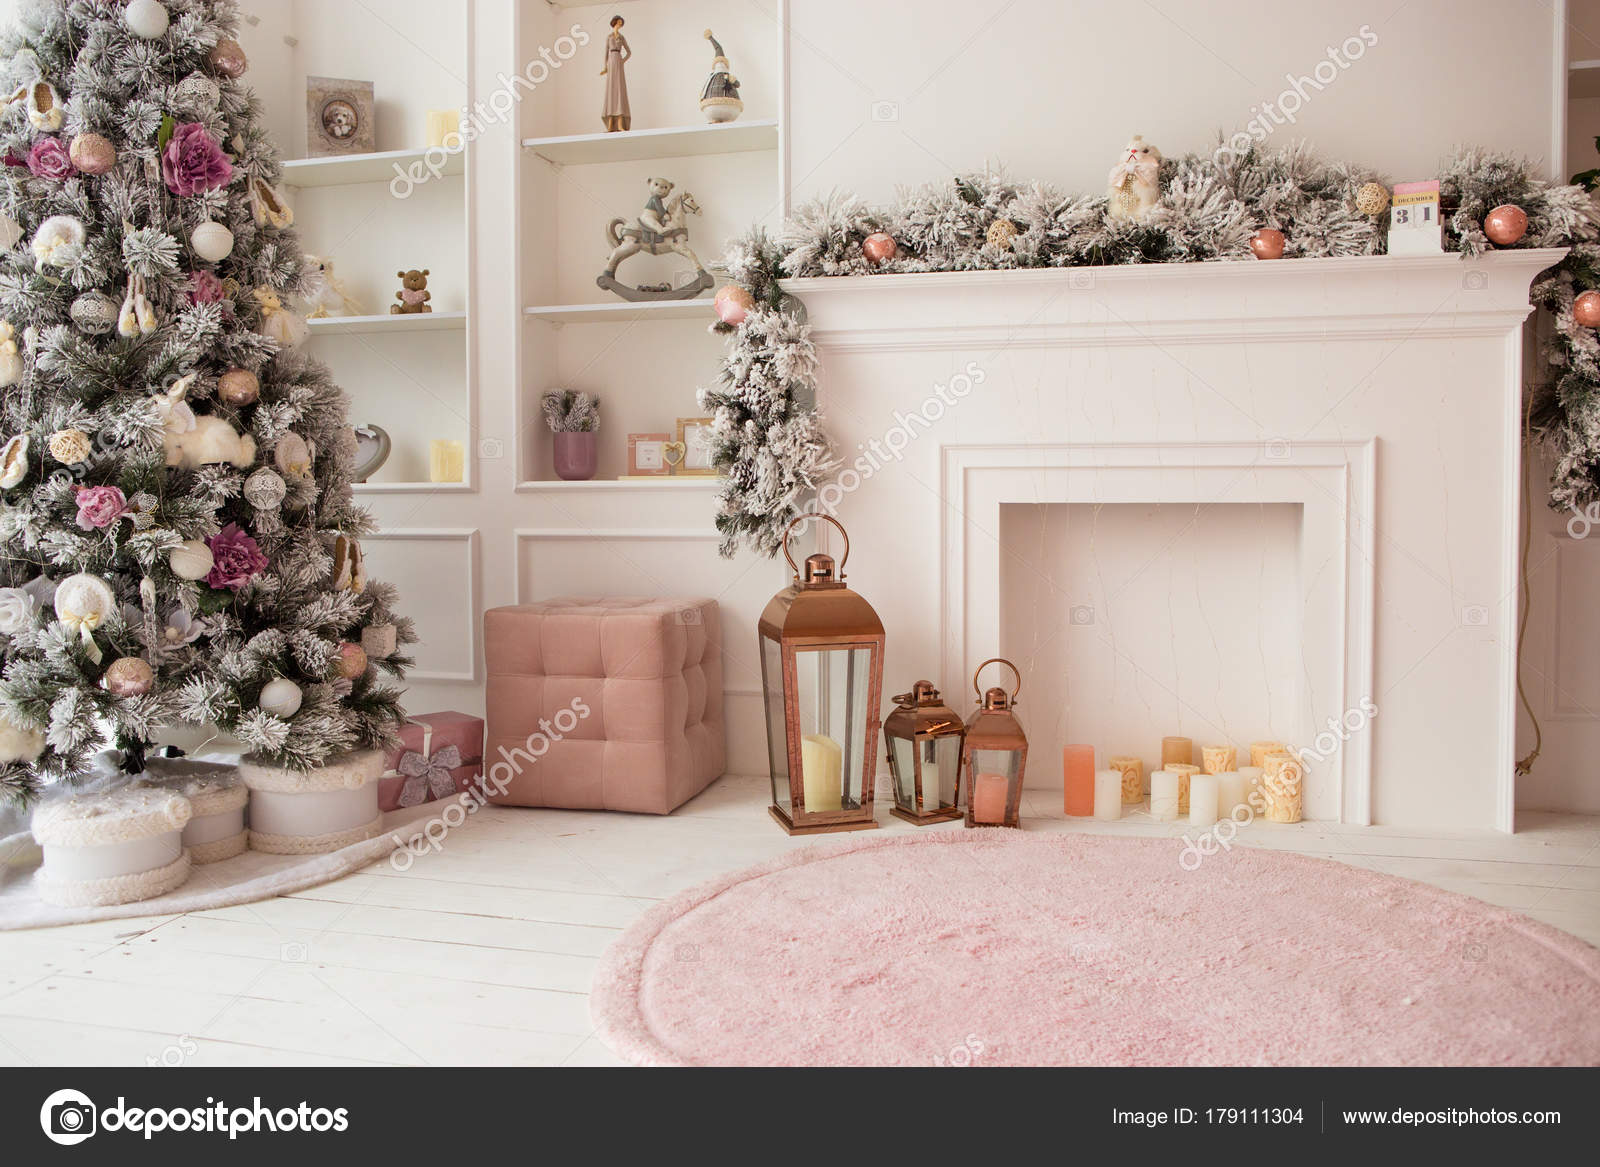 https://st3.depositphotos.com/1520772/17911/i/1600/depositphotos_179111304-stockafbeelding-woonkamer-in-witte-en-roze.jpg